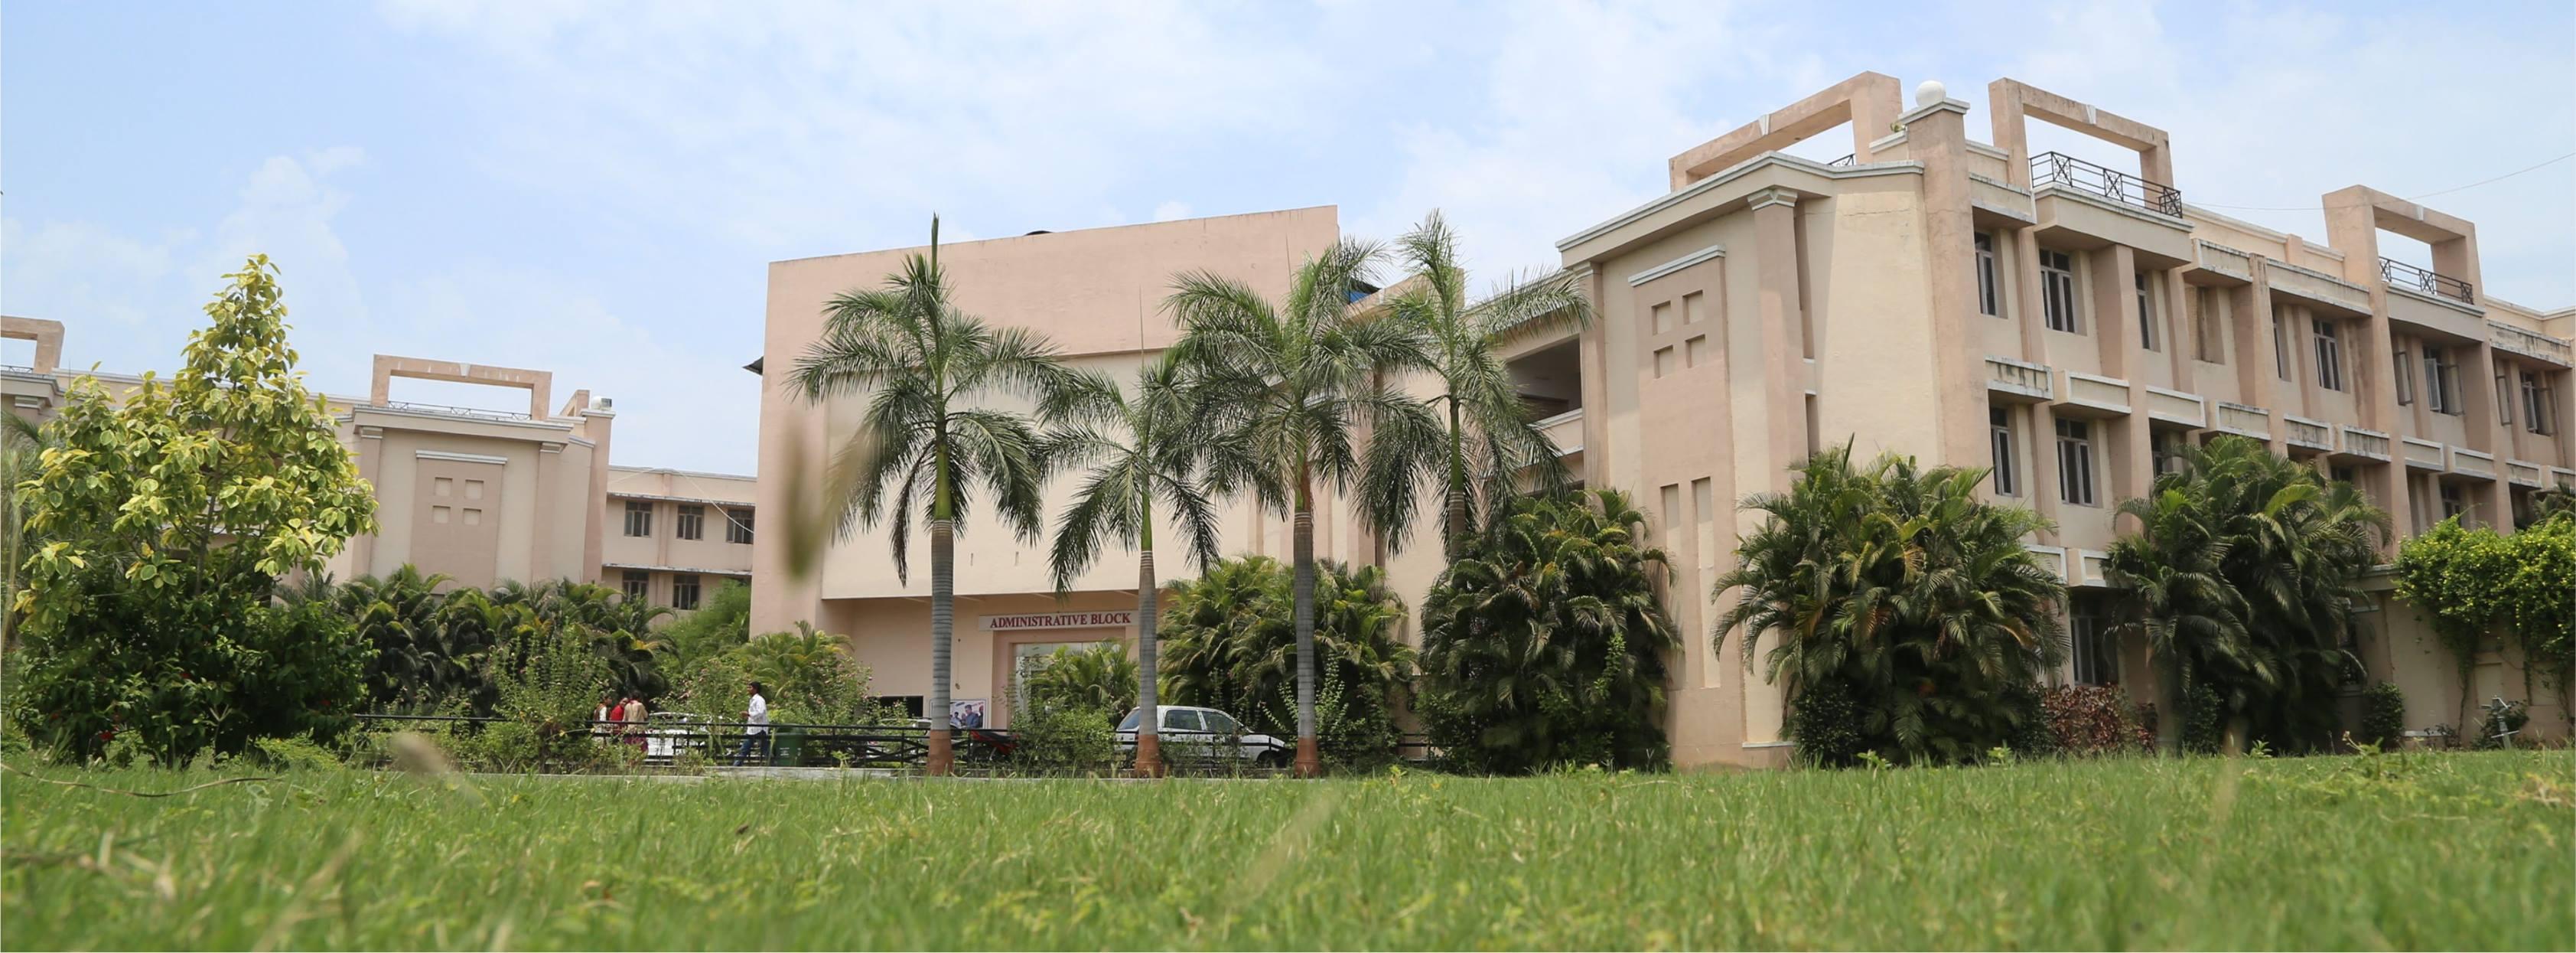 Parul University – PU Campus